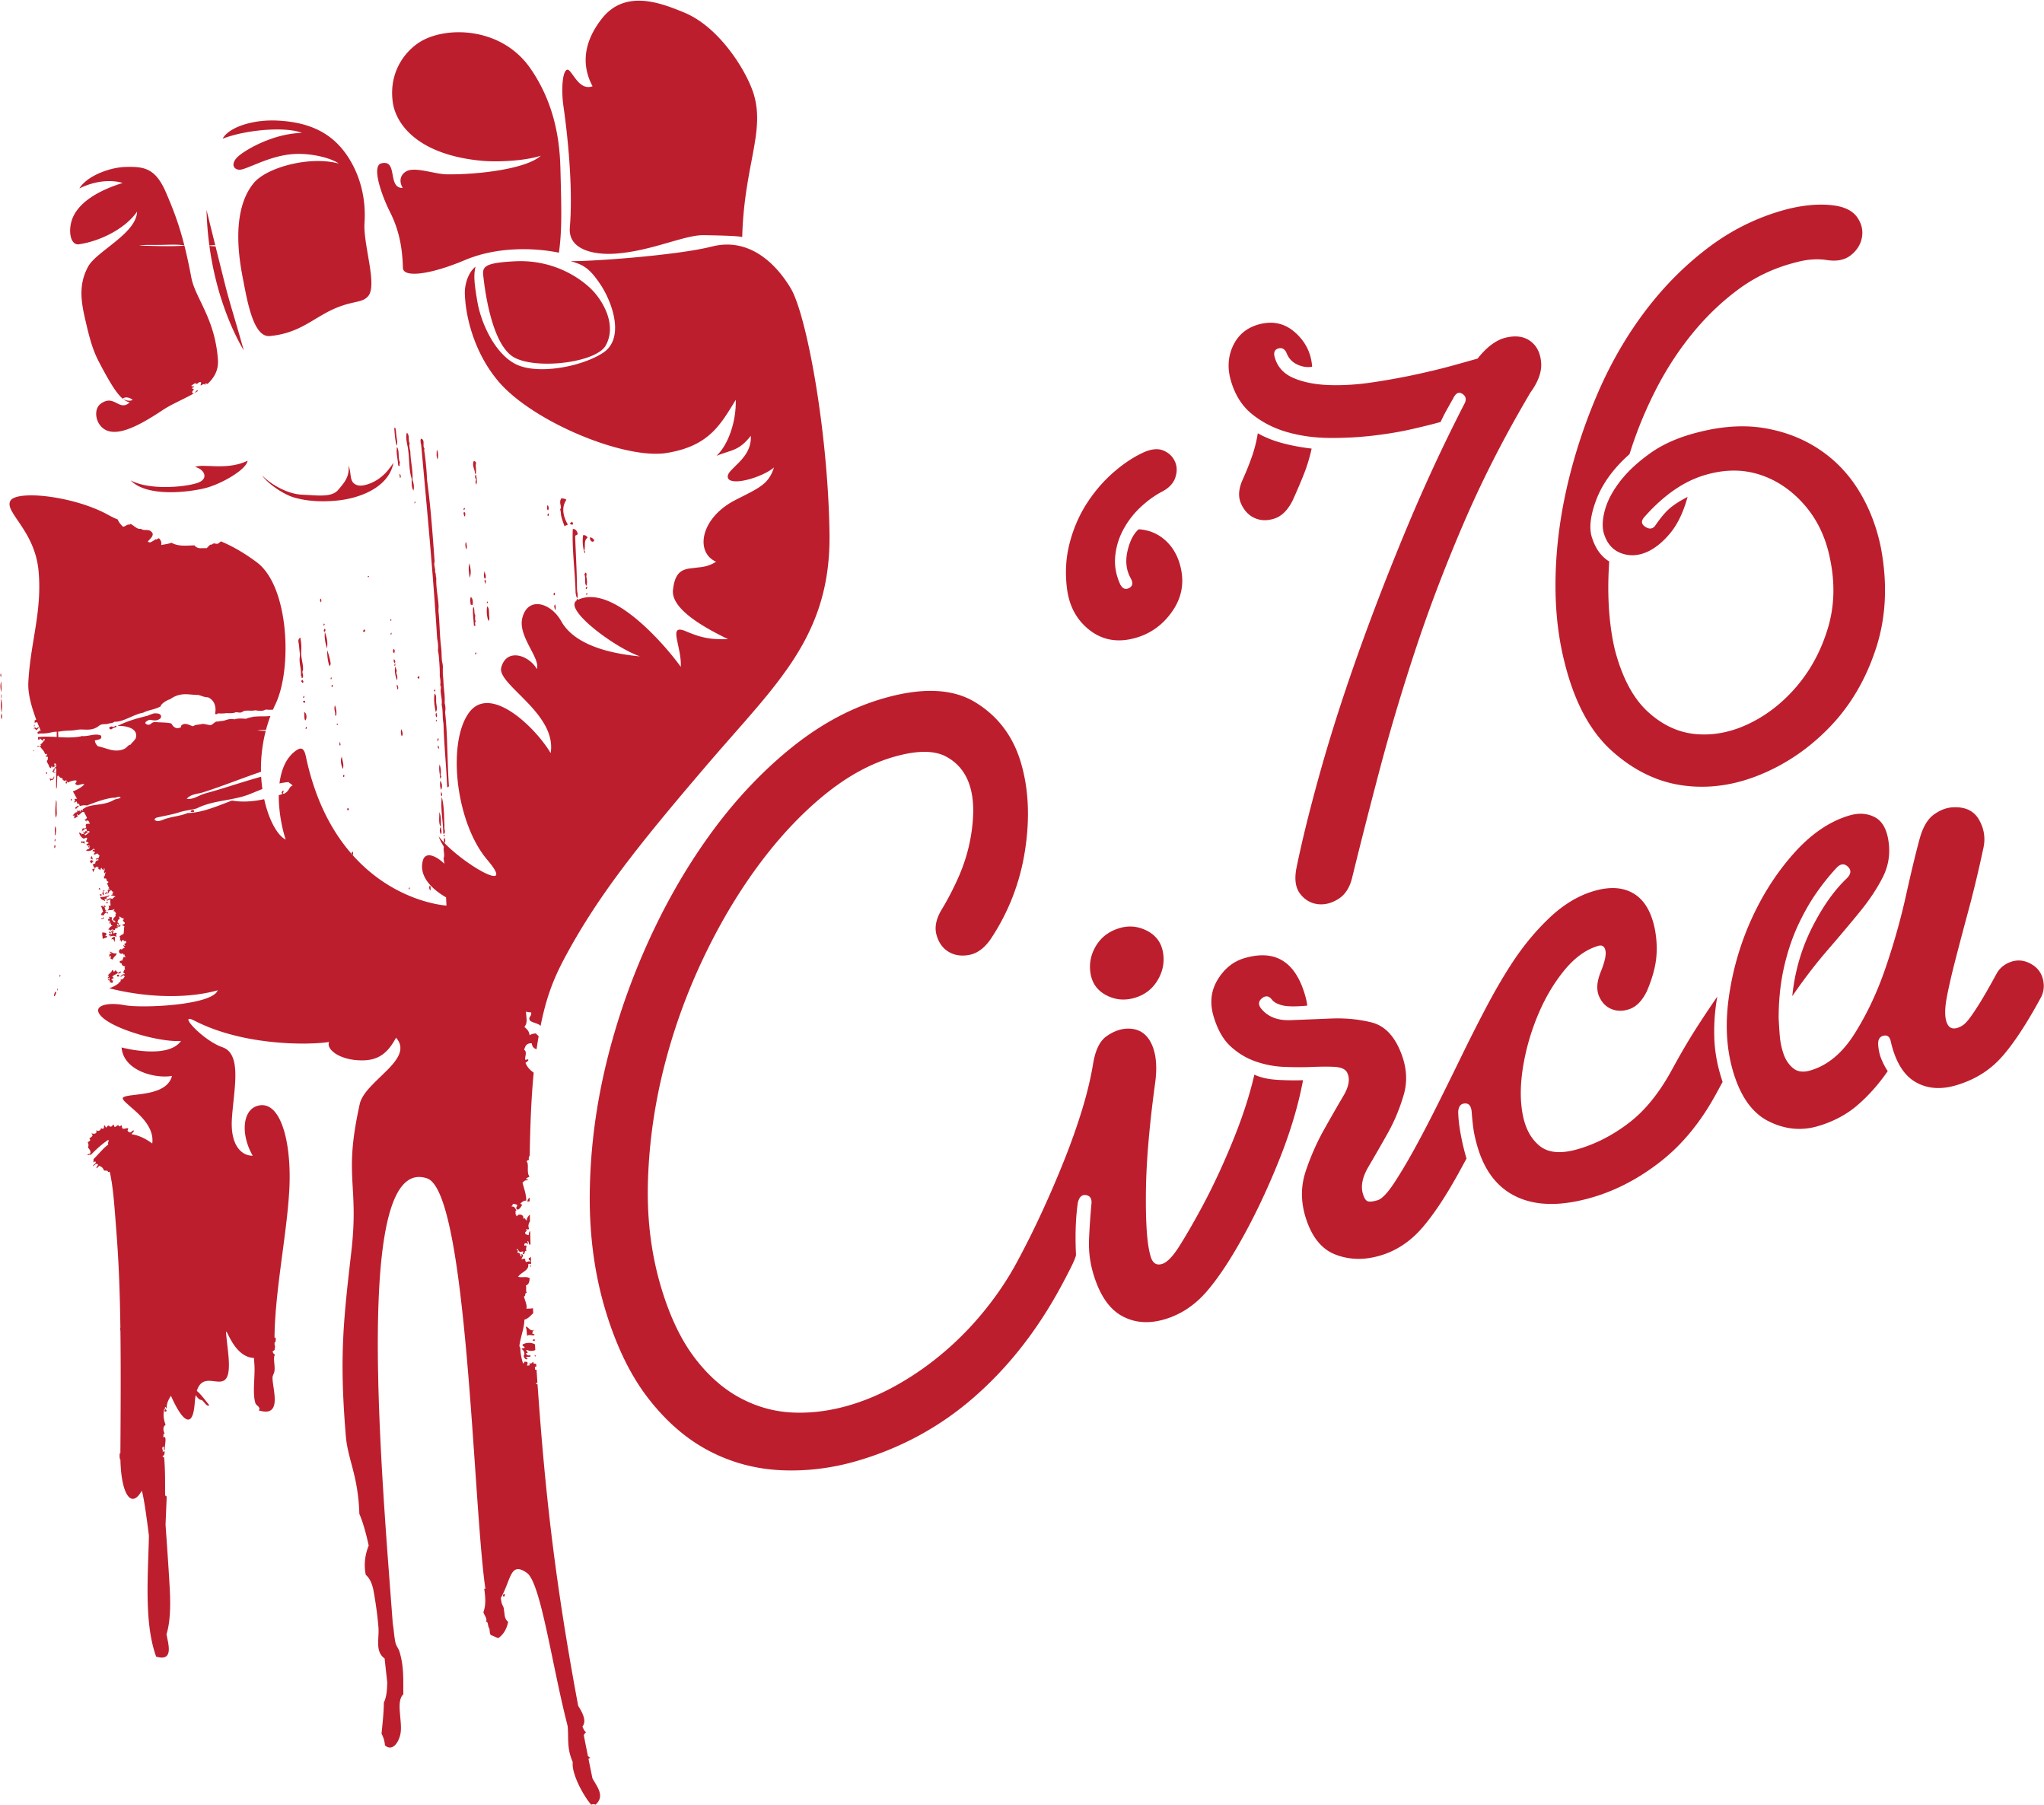 33fest & Circa 76